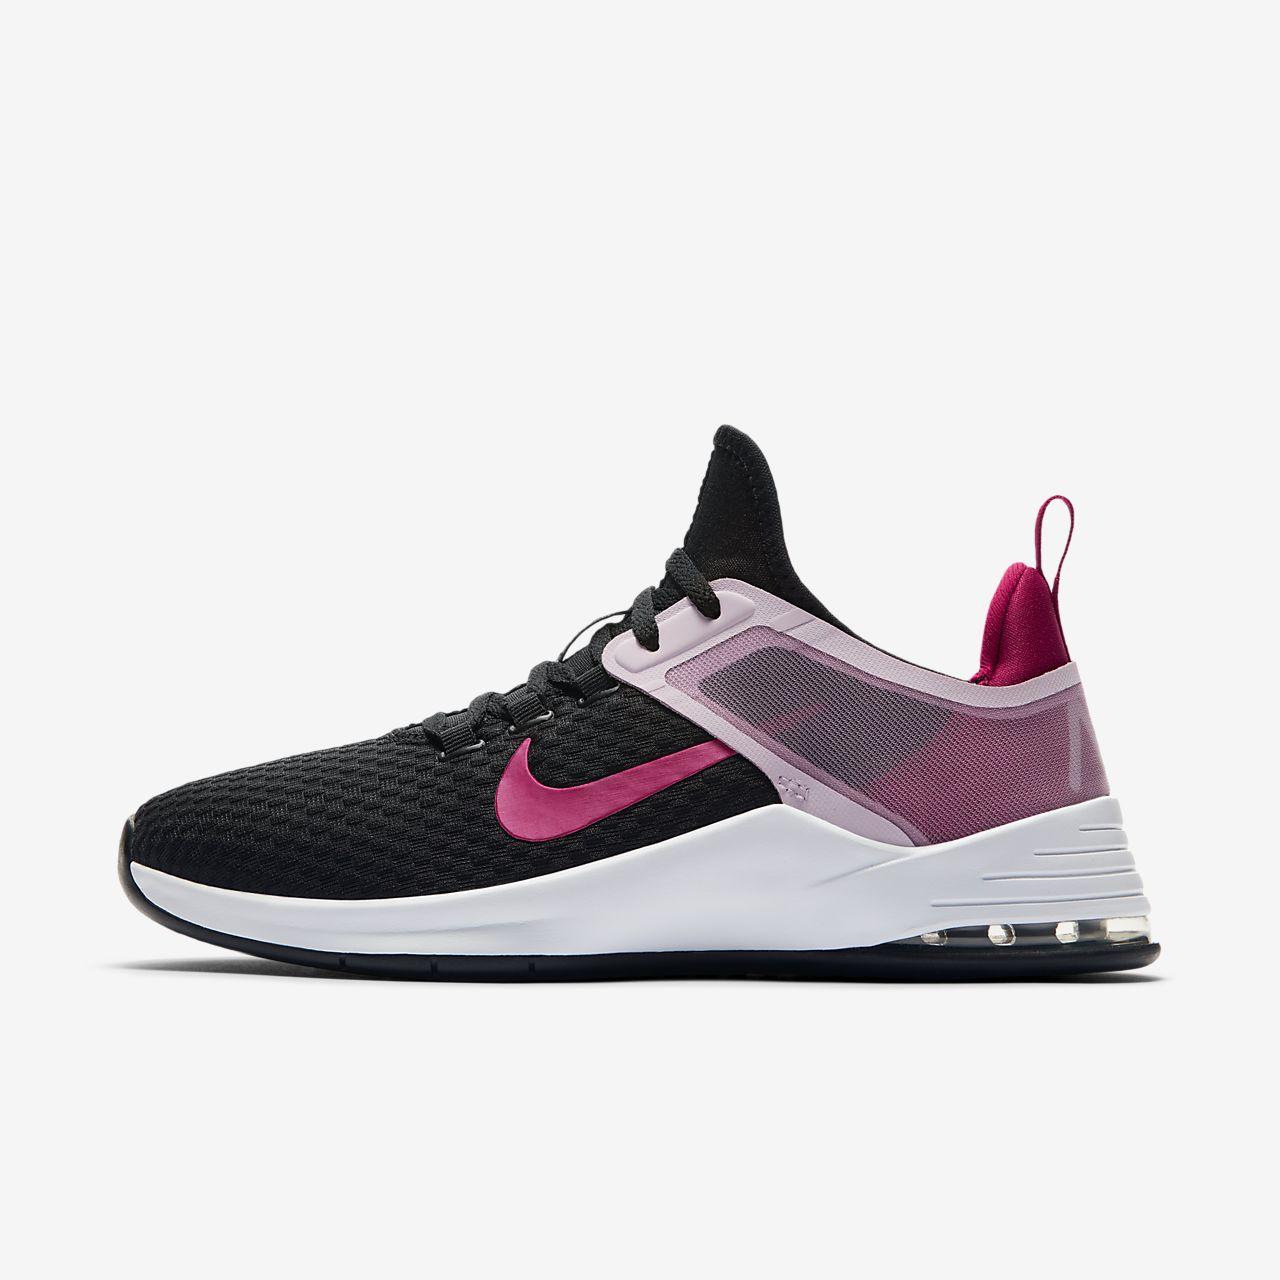 Sapatilhas de treino Nike Air Max Bella TR 2 para mulher